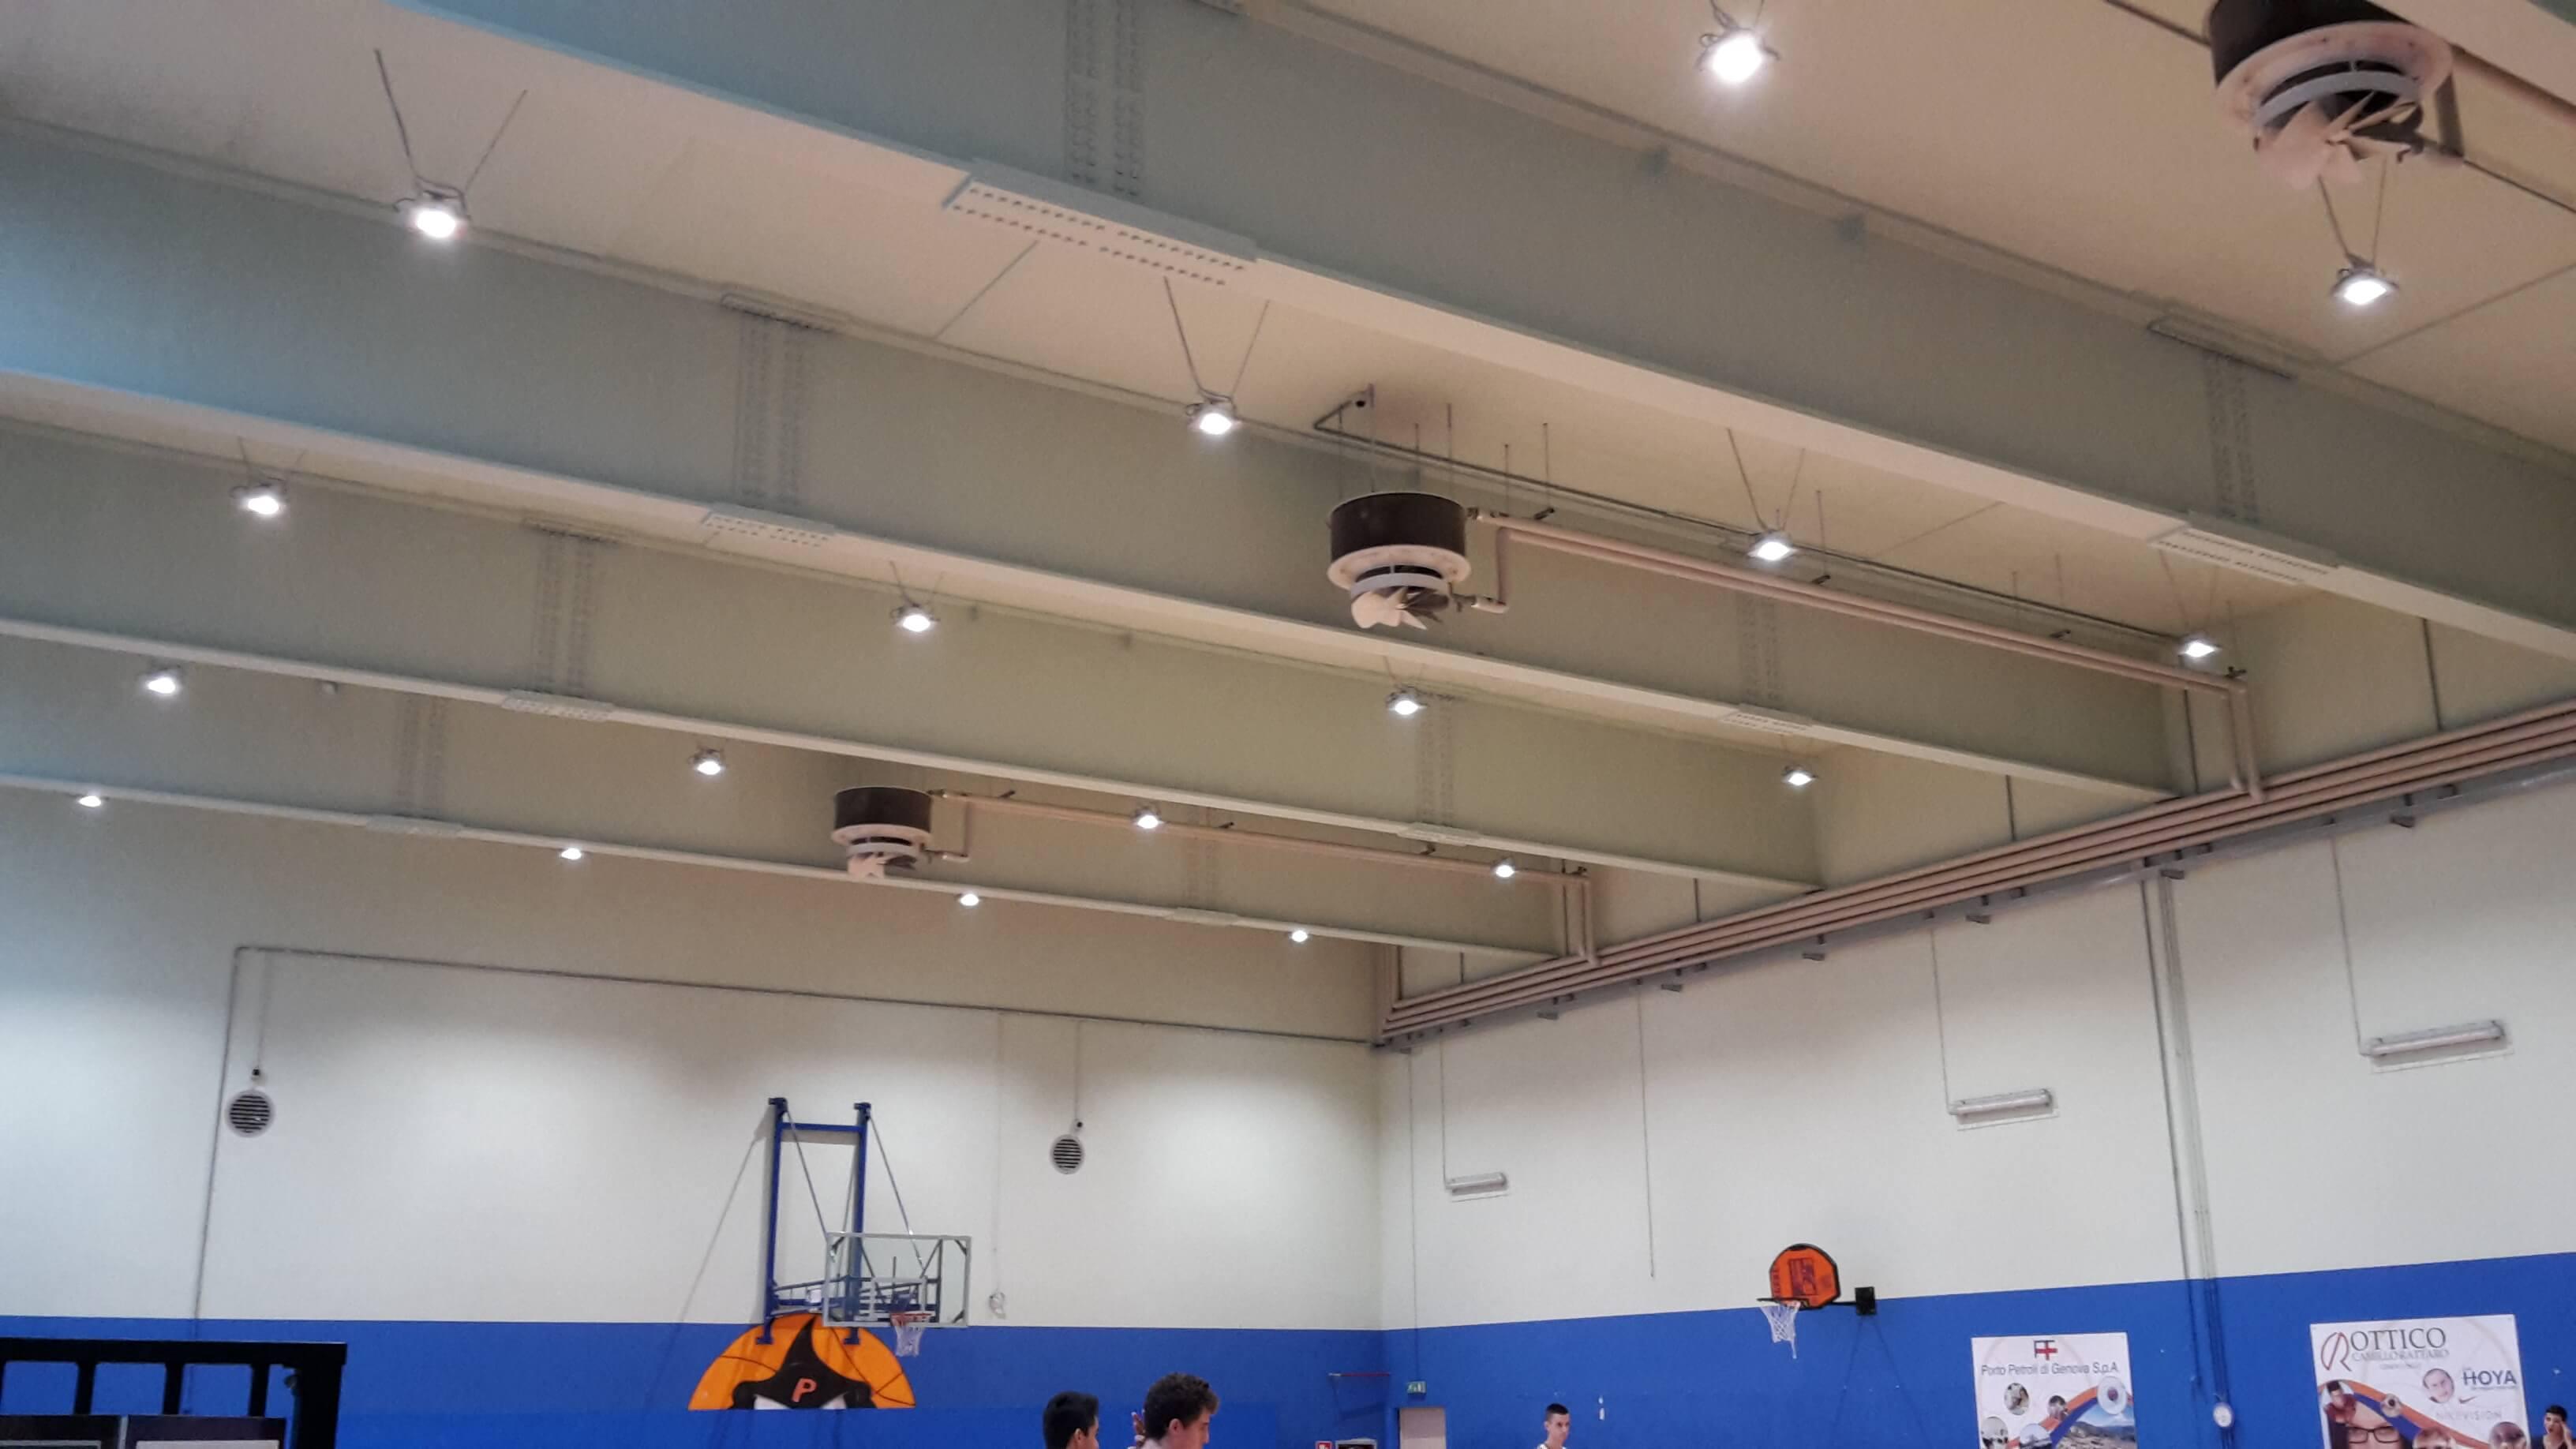 Palasharkers-pegli-palazzetto-per-il-basket-genova-2